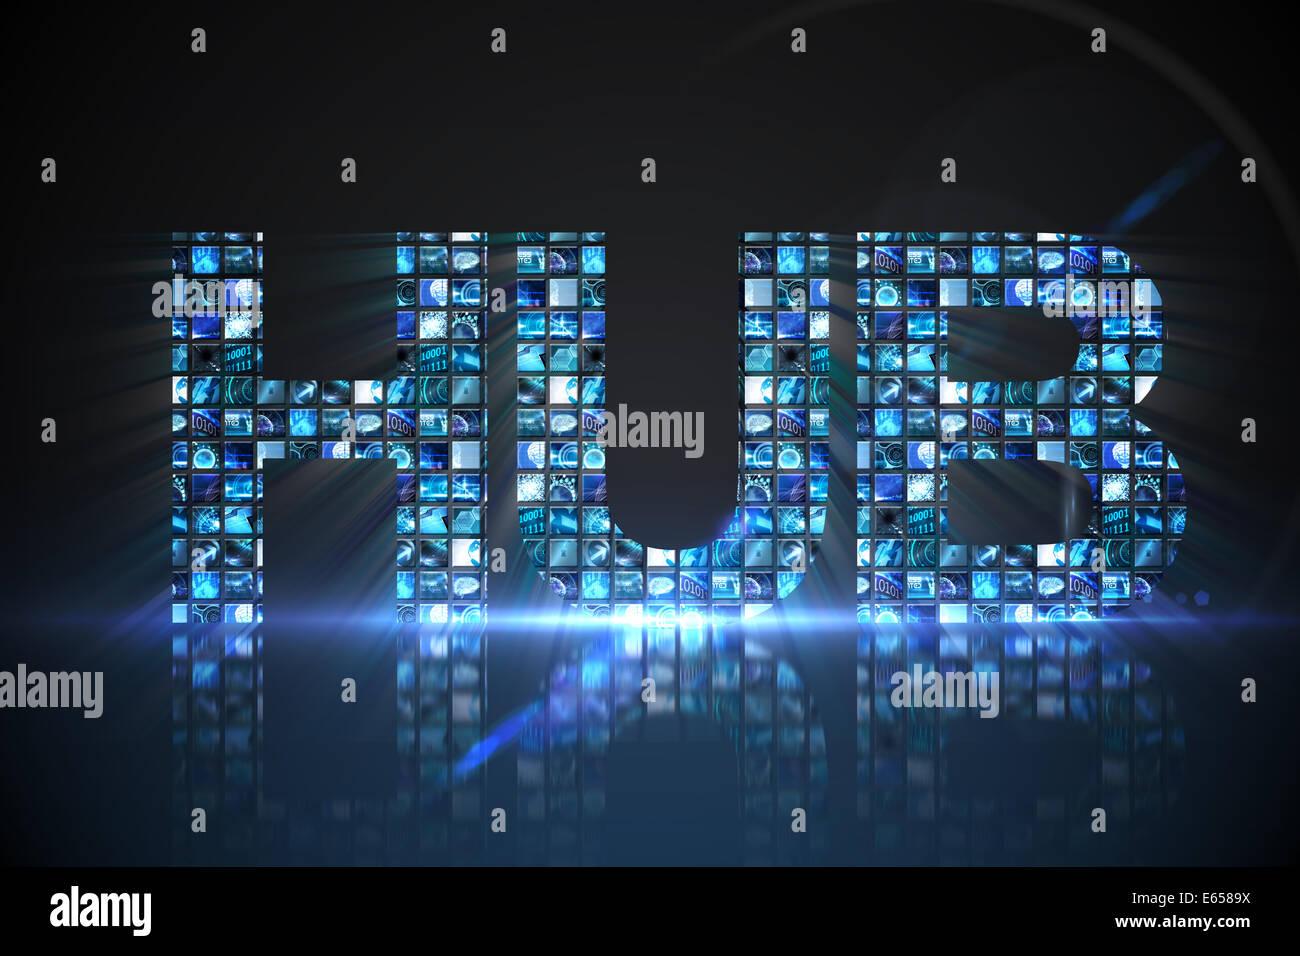 Hub made of digital screens in blue - Stock Image